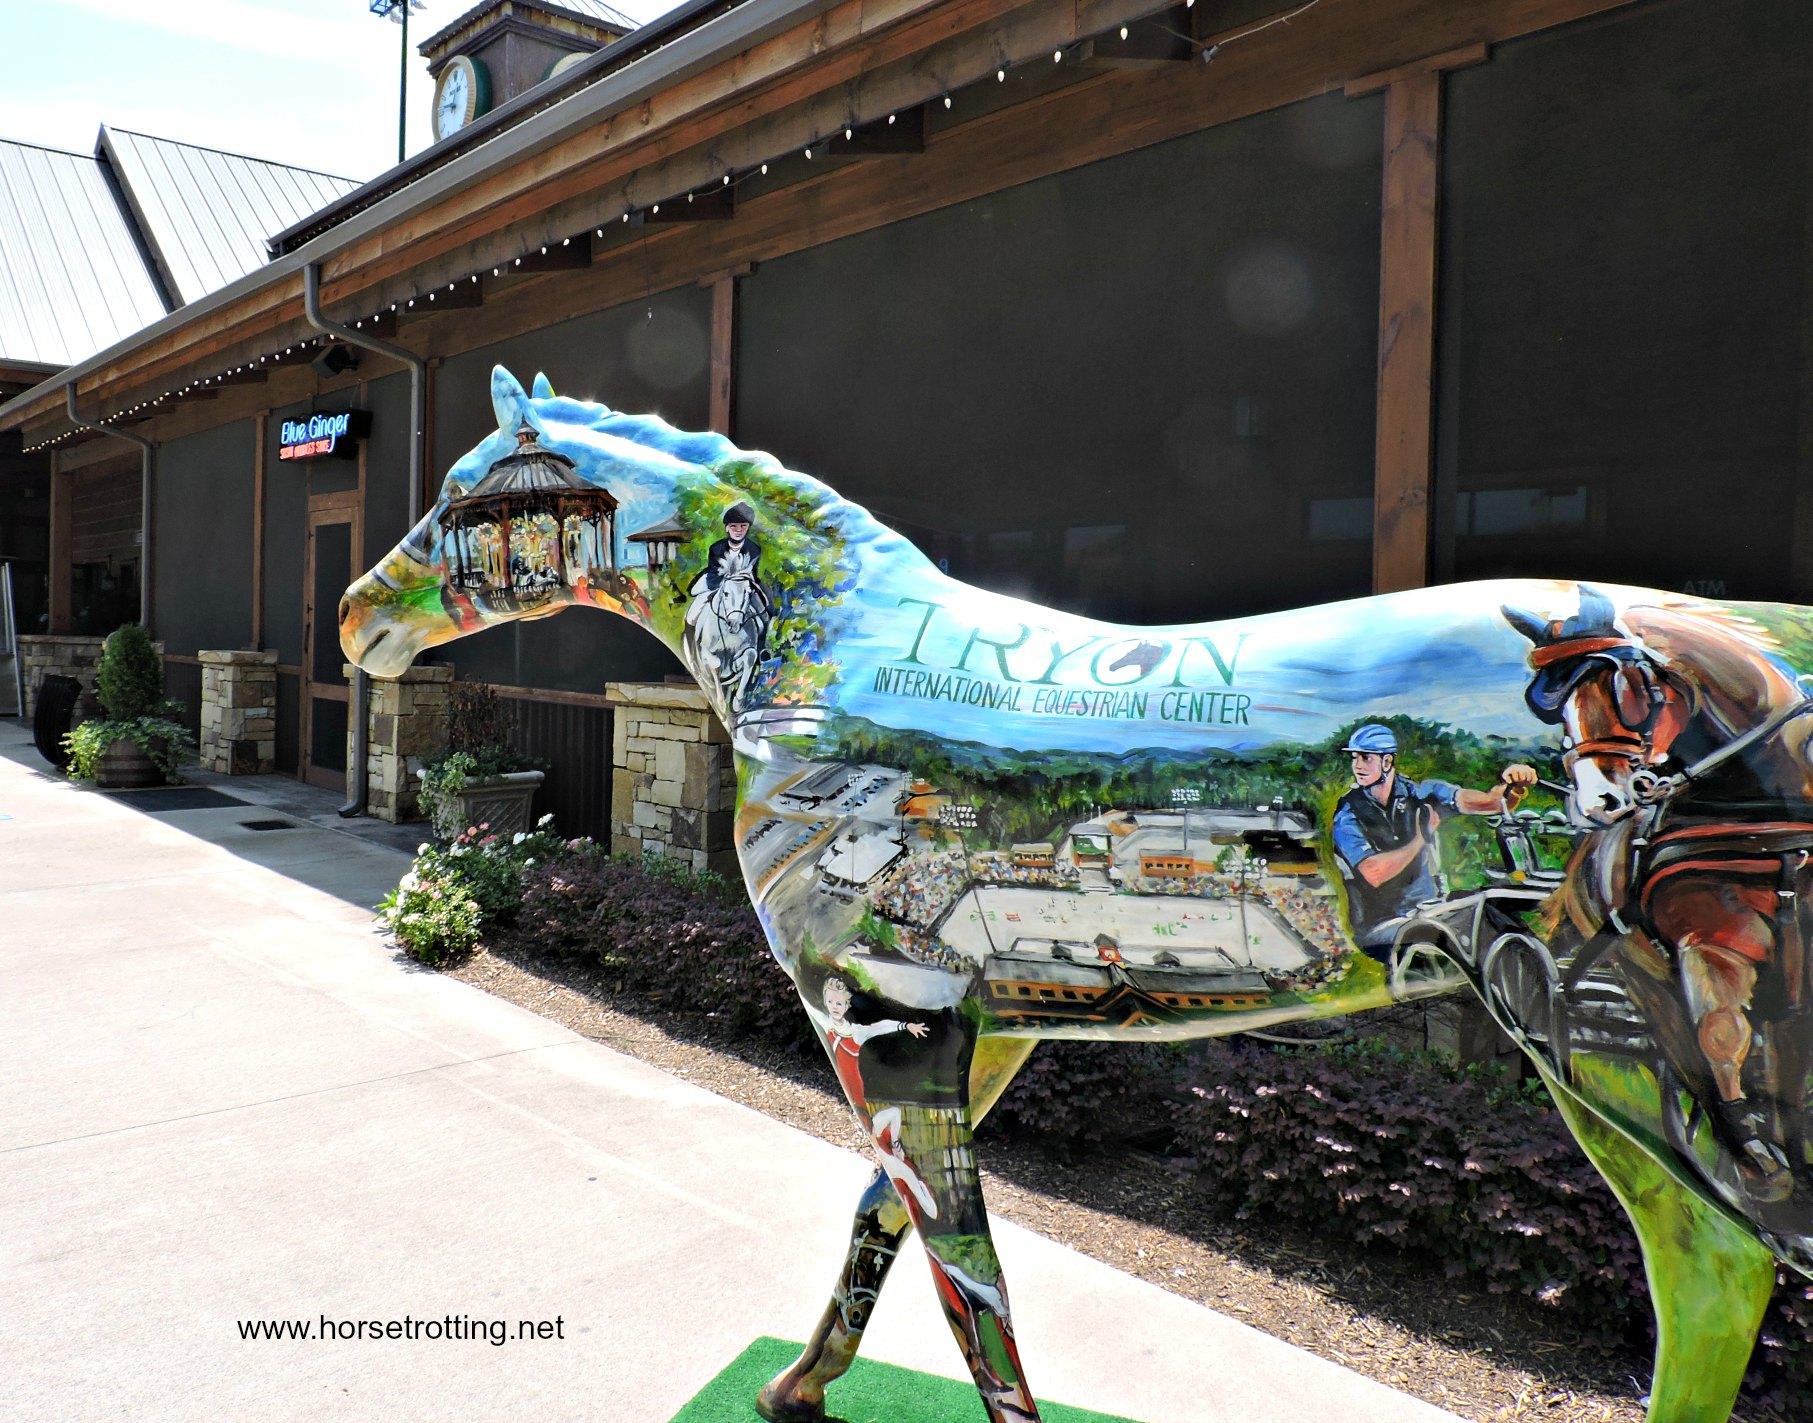 Tyron International Equestrian Center, North Carolina